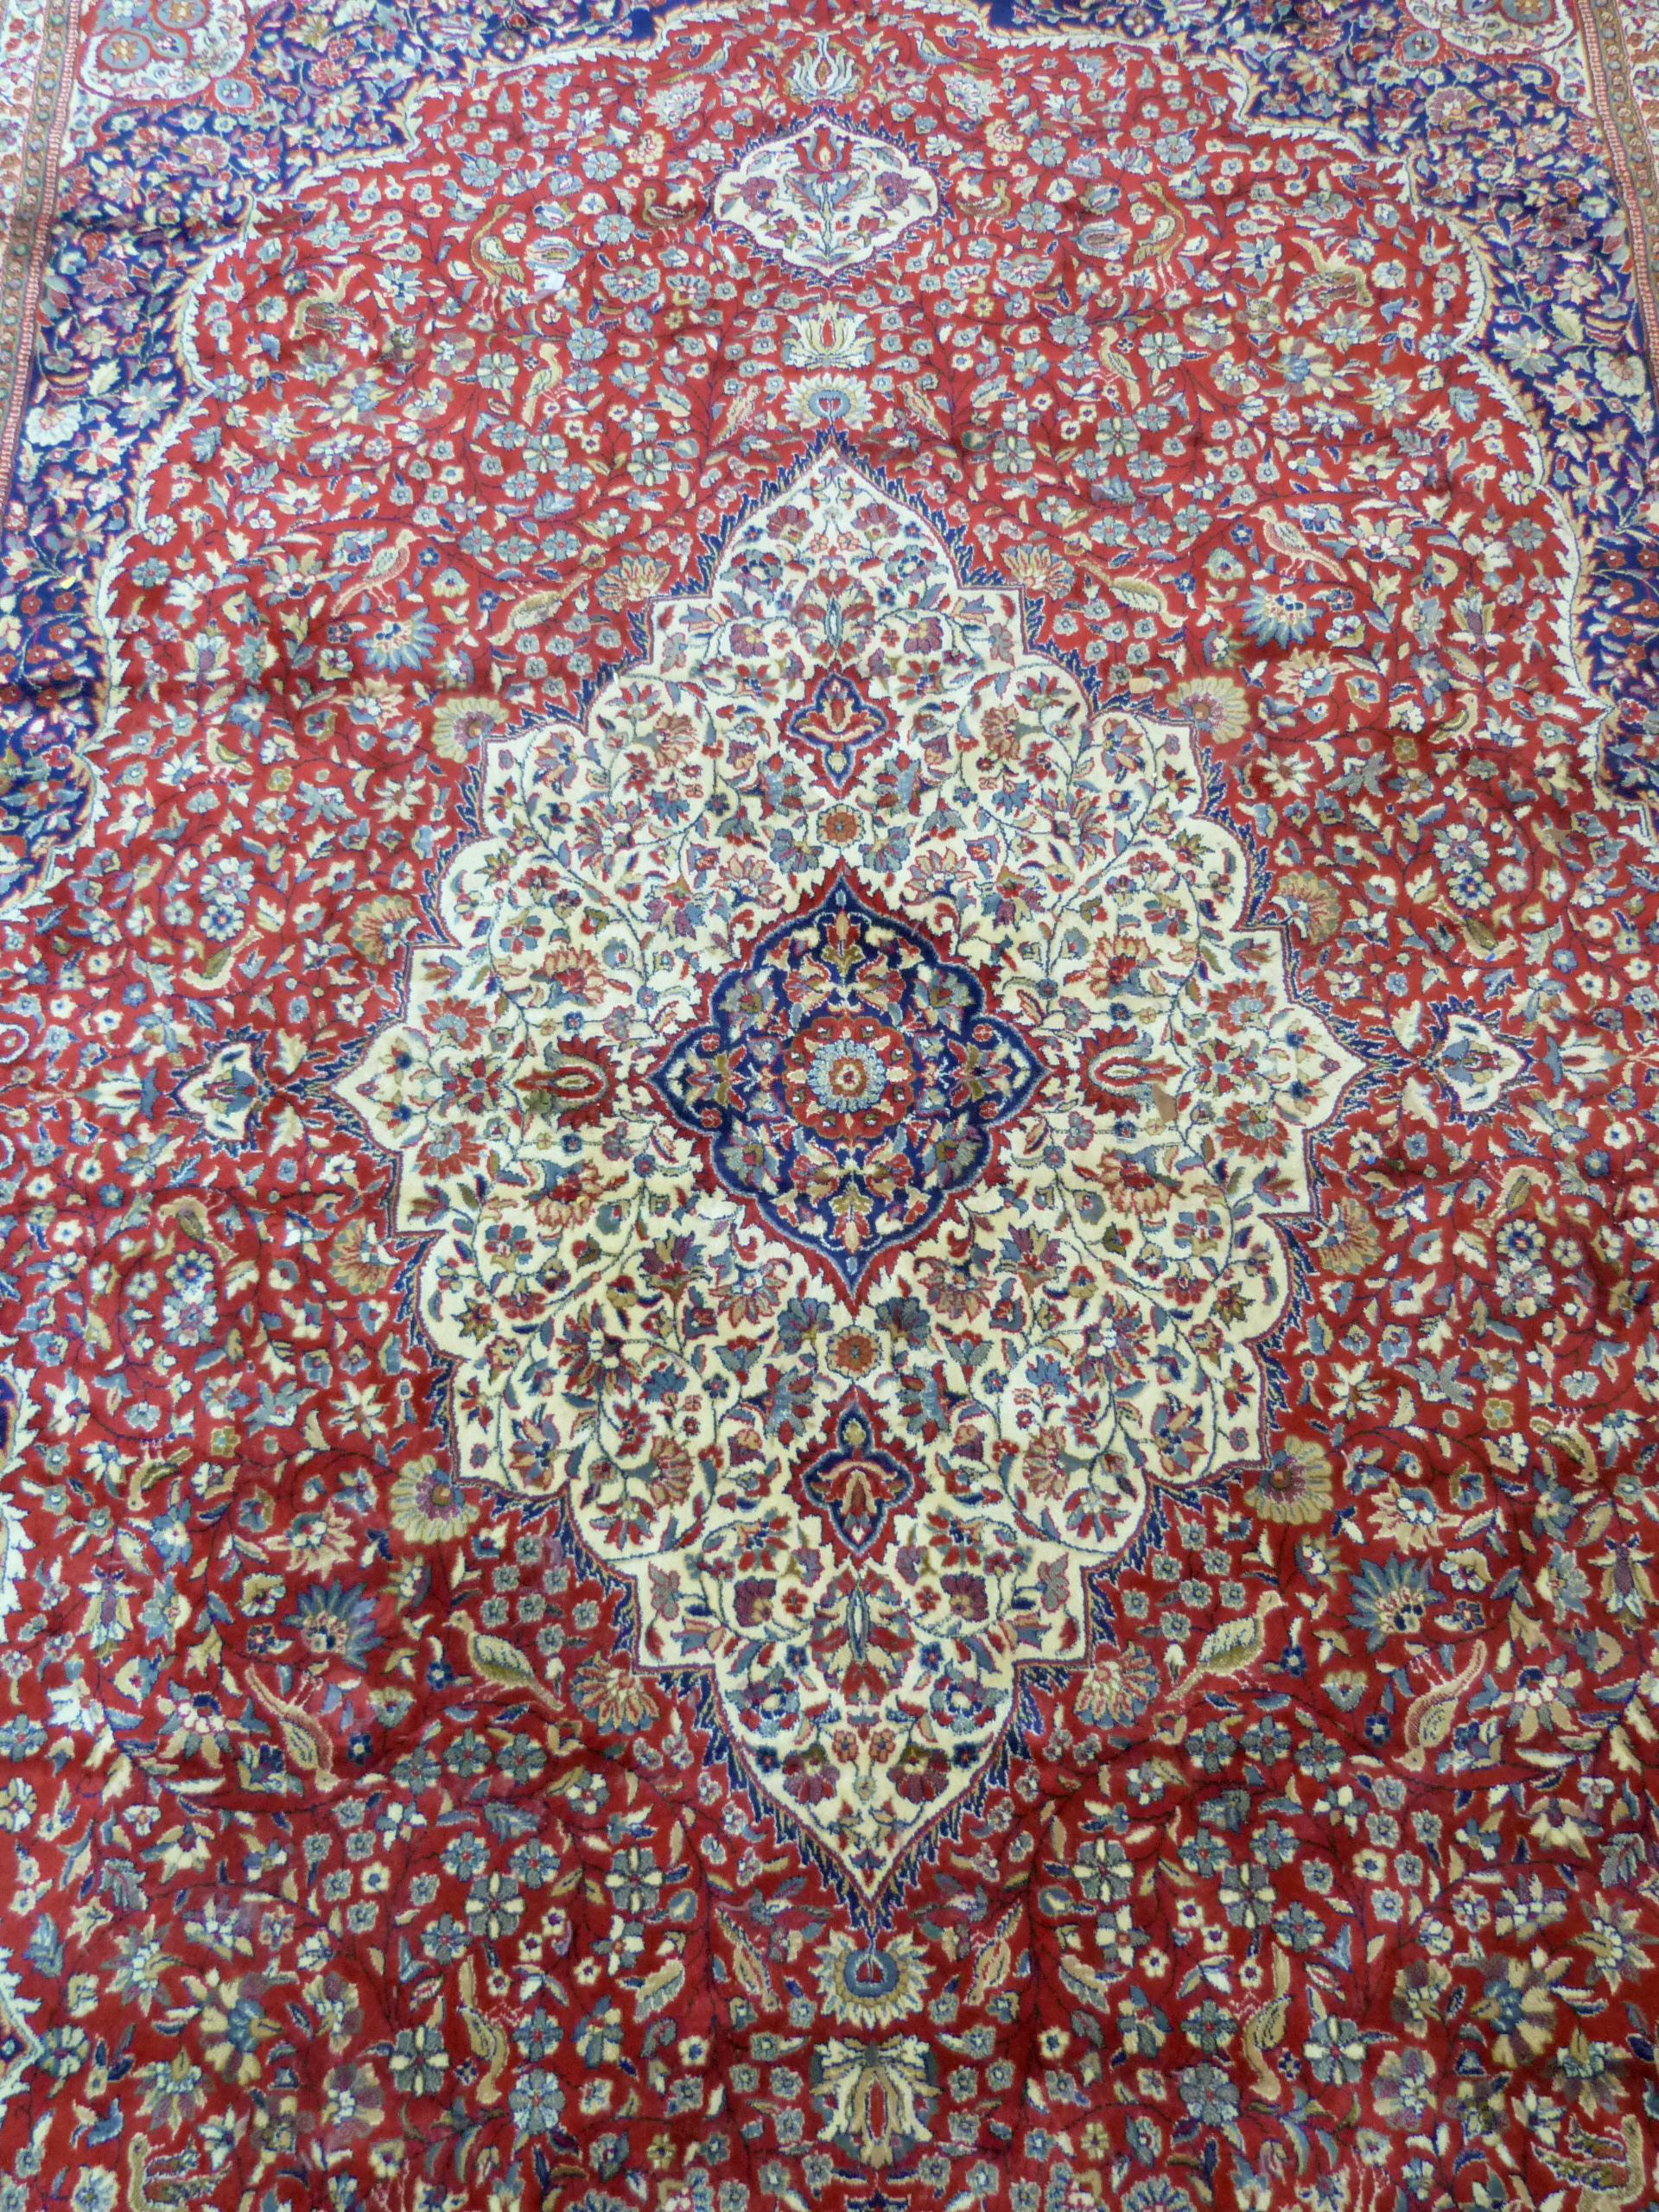 Large red ground full-pile Kashmir Carpet, floral medallion design, 340cm x 230 cm approx - Image 5 of 8